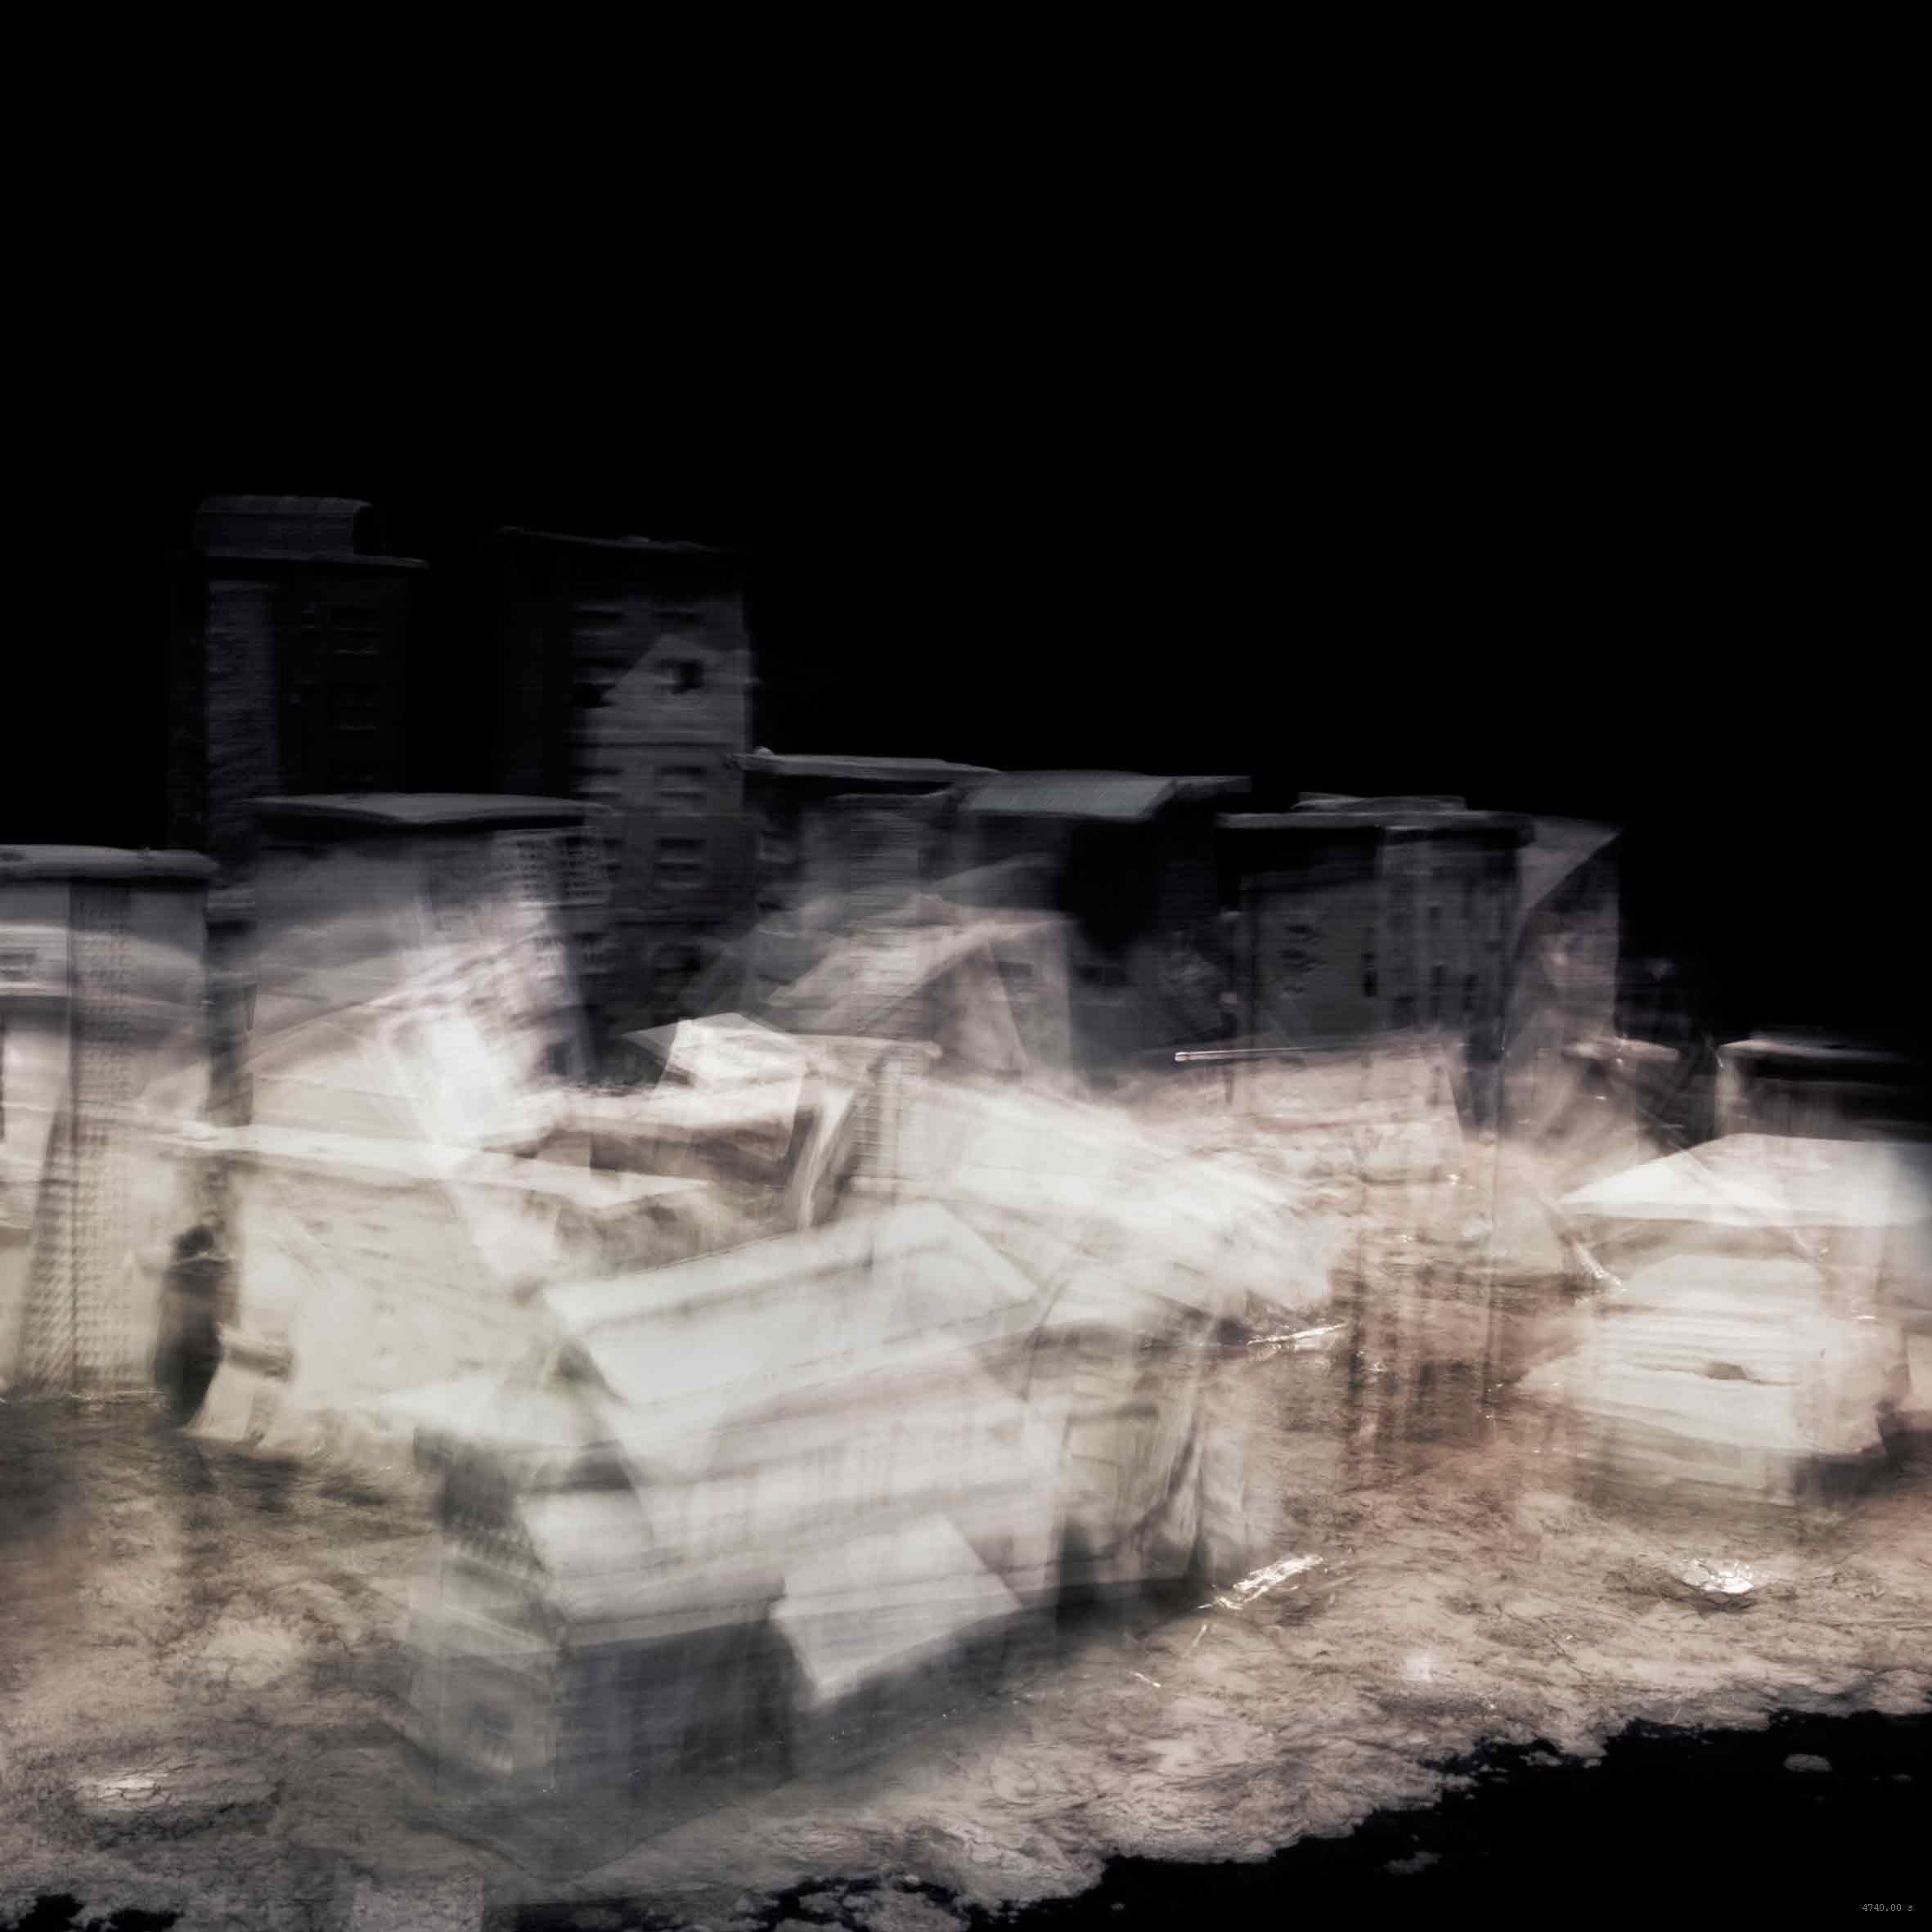 CYRUS TANG   4740.00 s  2016 Archival Giclee Print 90 x 90 cm